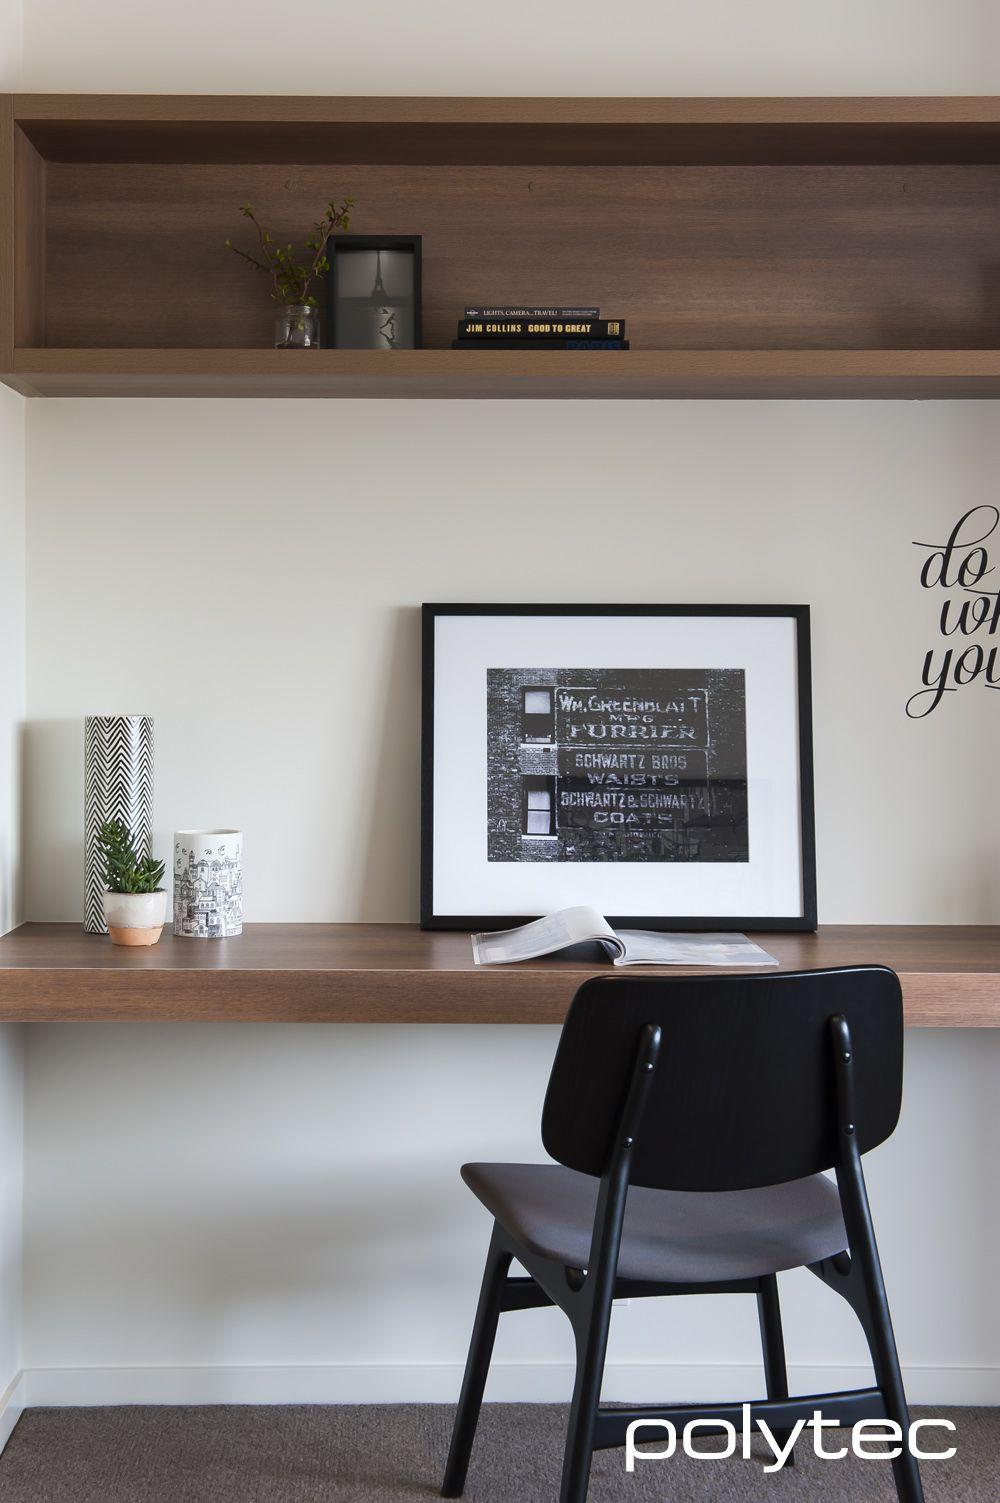 polytec - desk and shelving in RAVINE Sepia Oak. Stylish modern ...